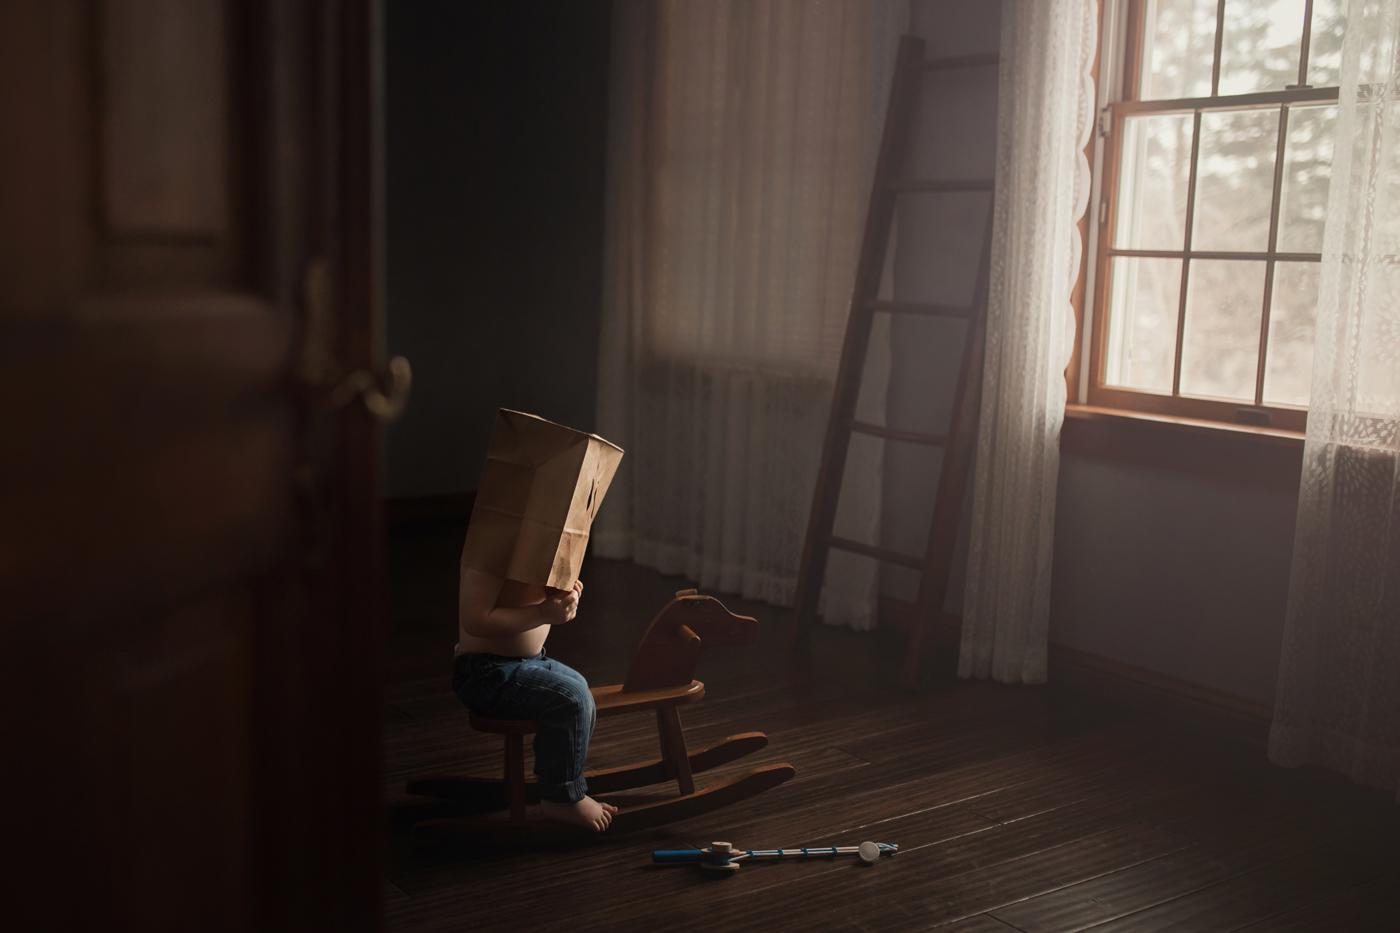 'Different View' by Meg Loeks